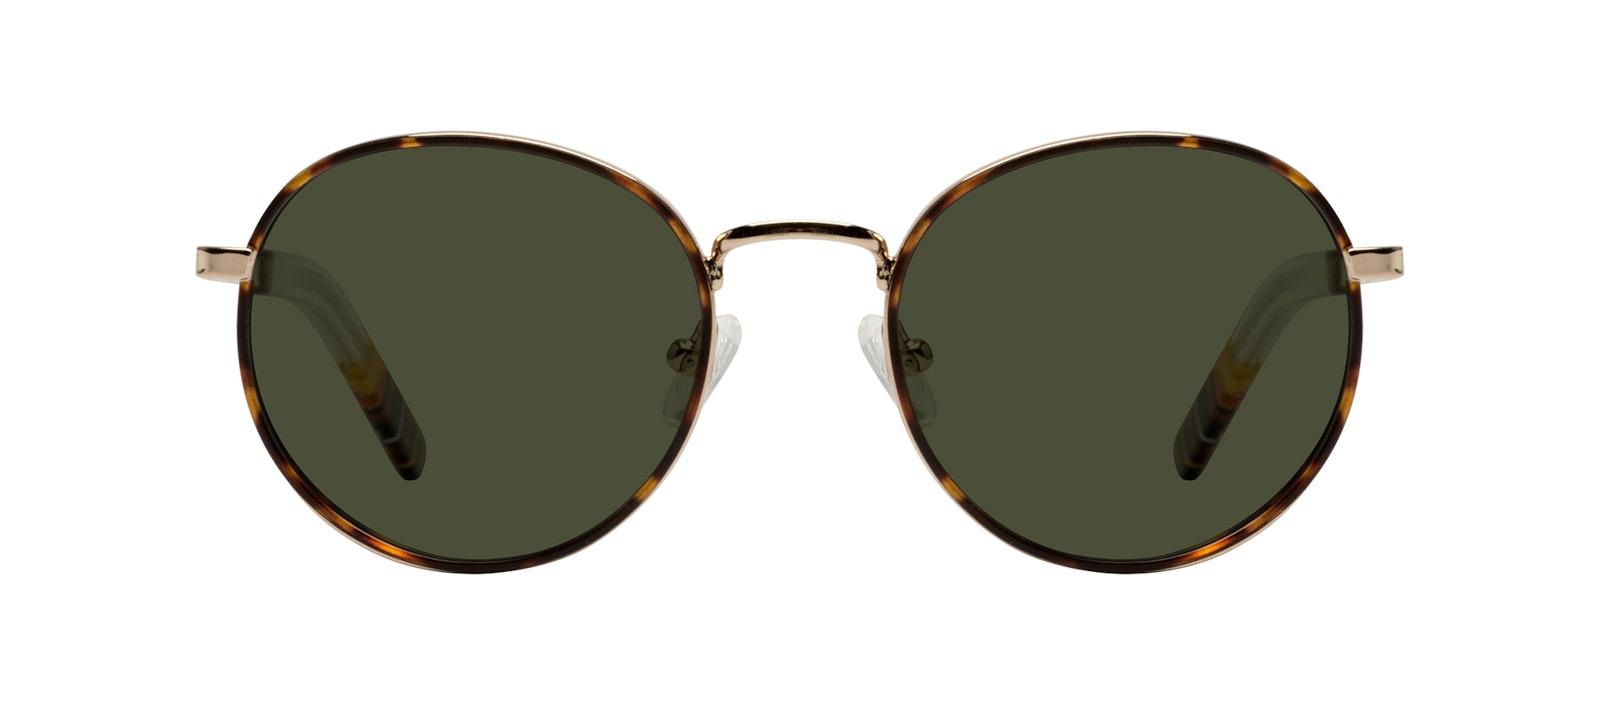 Affordable Fashion Glasses Round Sunglasses Men Reach Tortoise Front